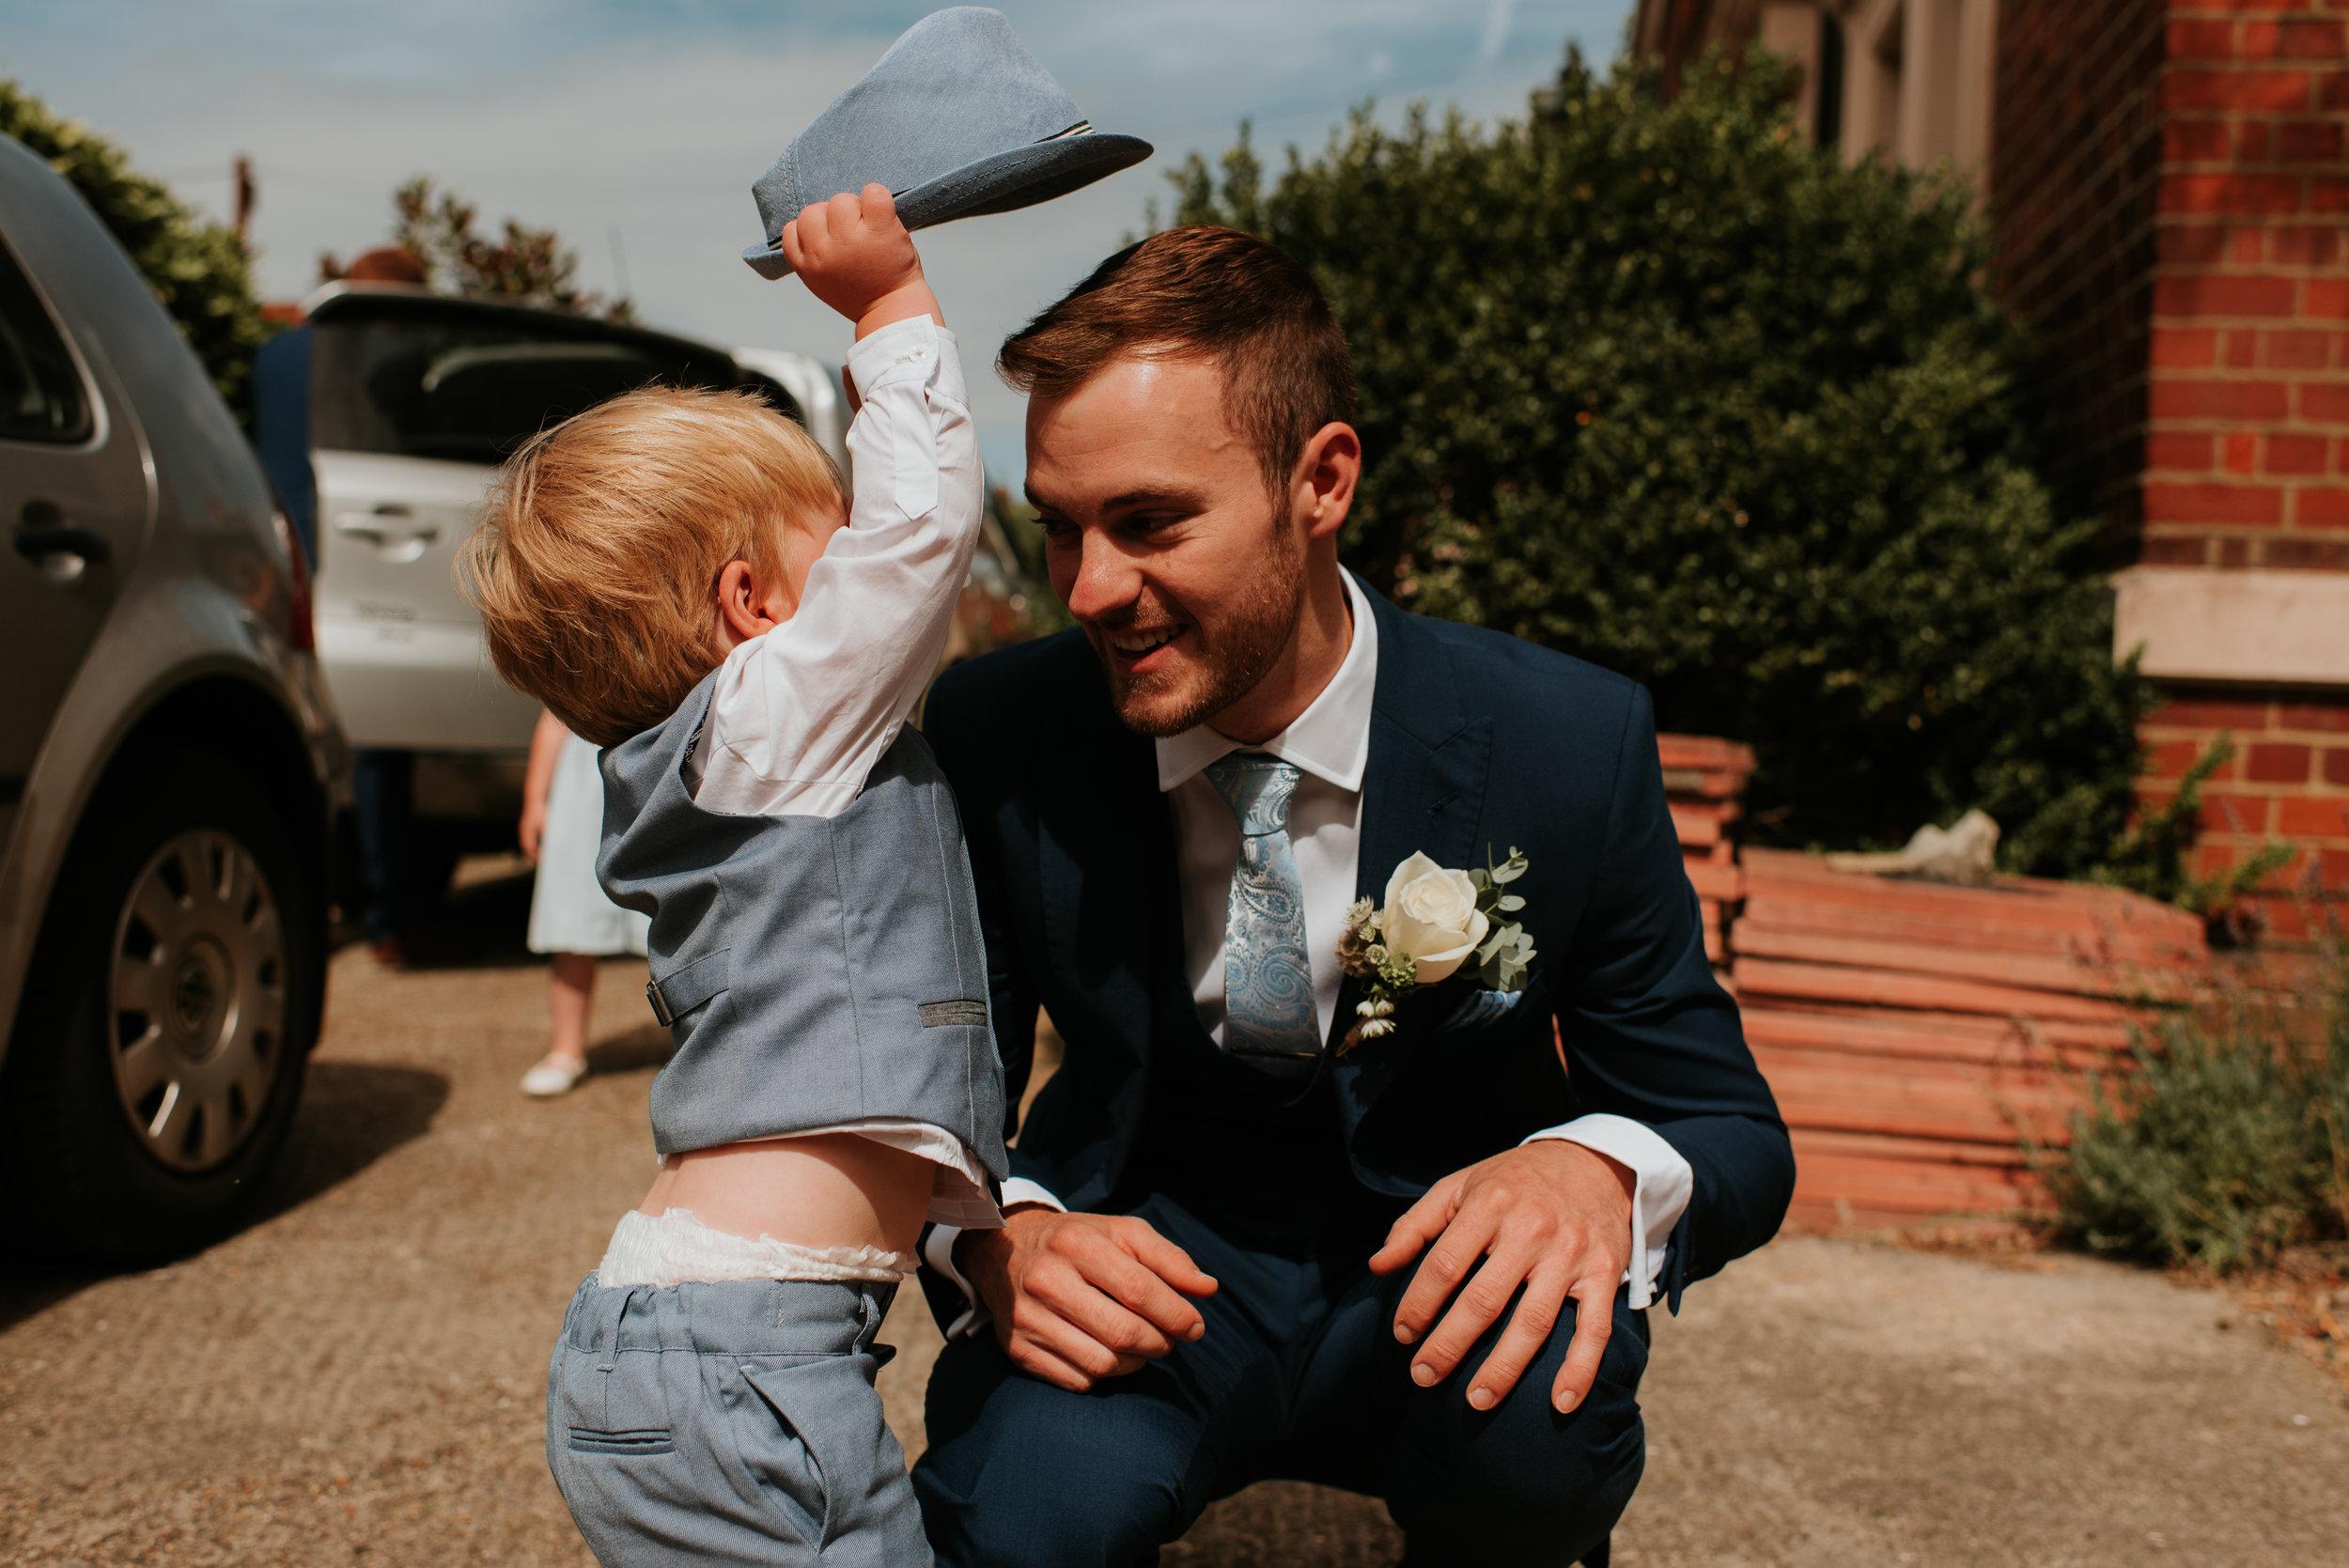 Family wedding photographer Oxfordshire